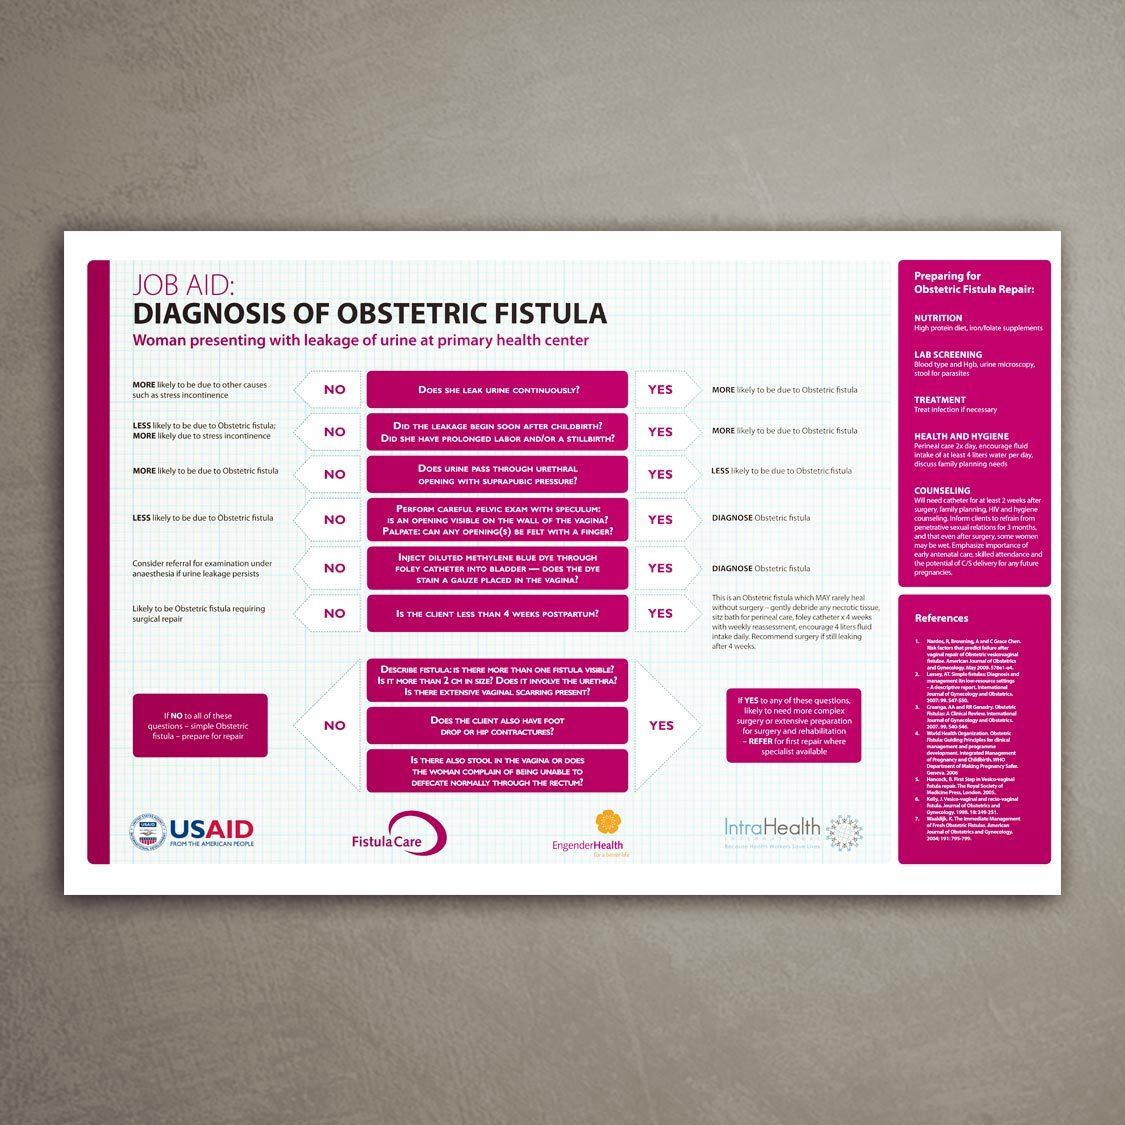 <b>Clinical poster</b> on fistula diagnosis